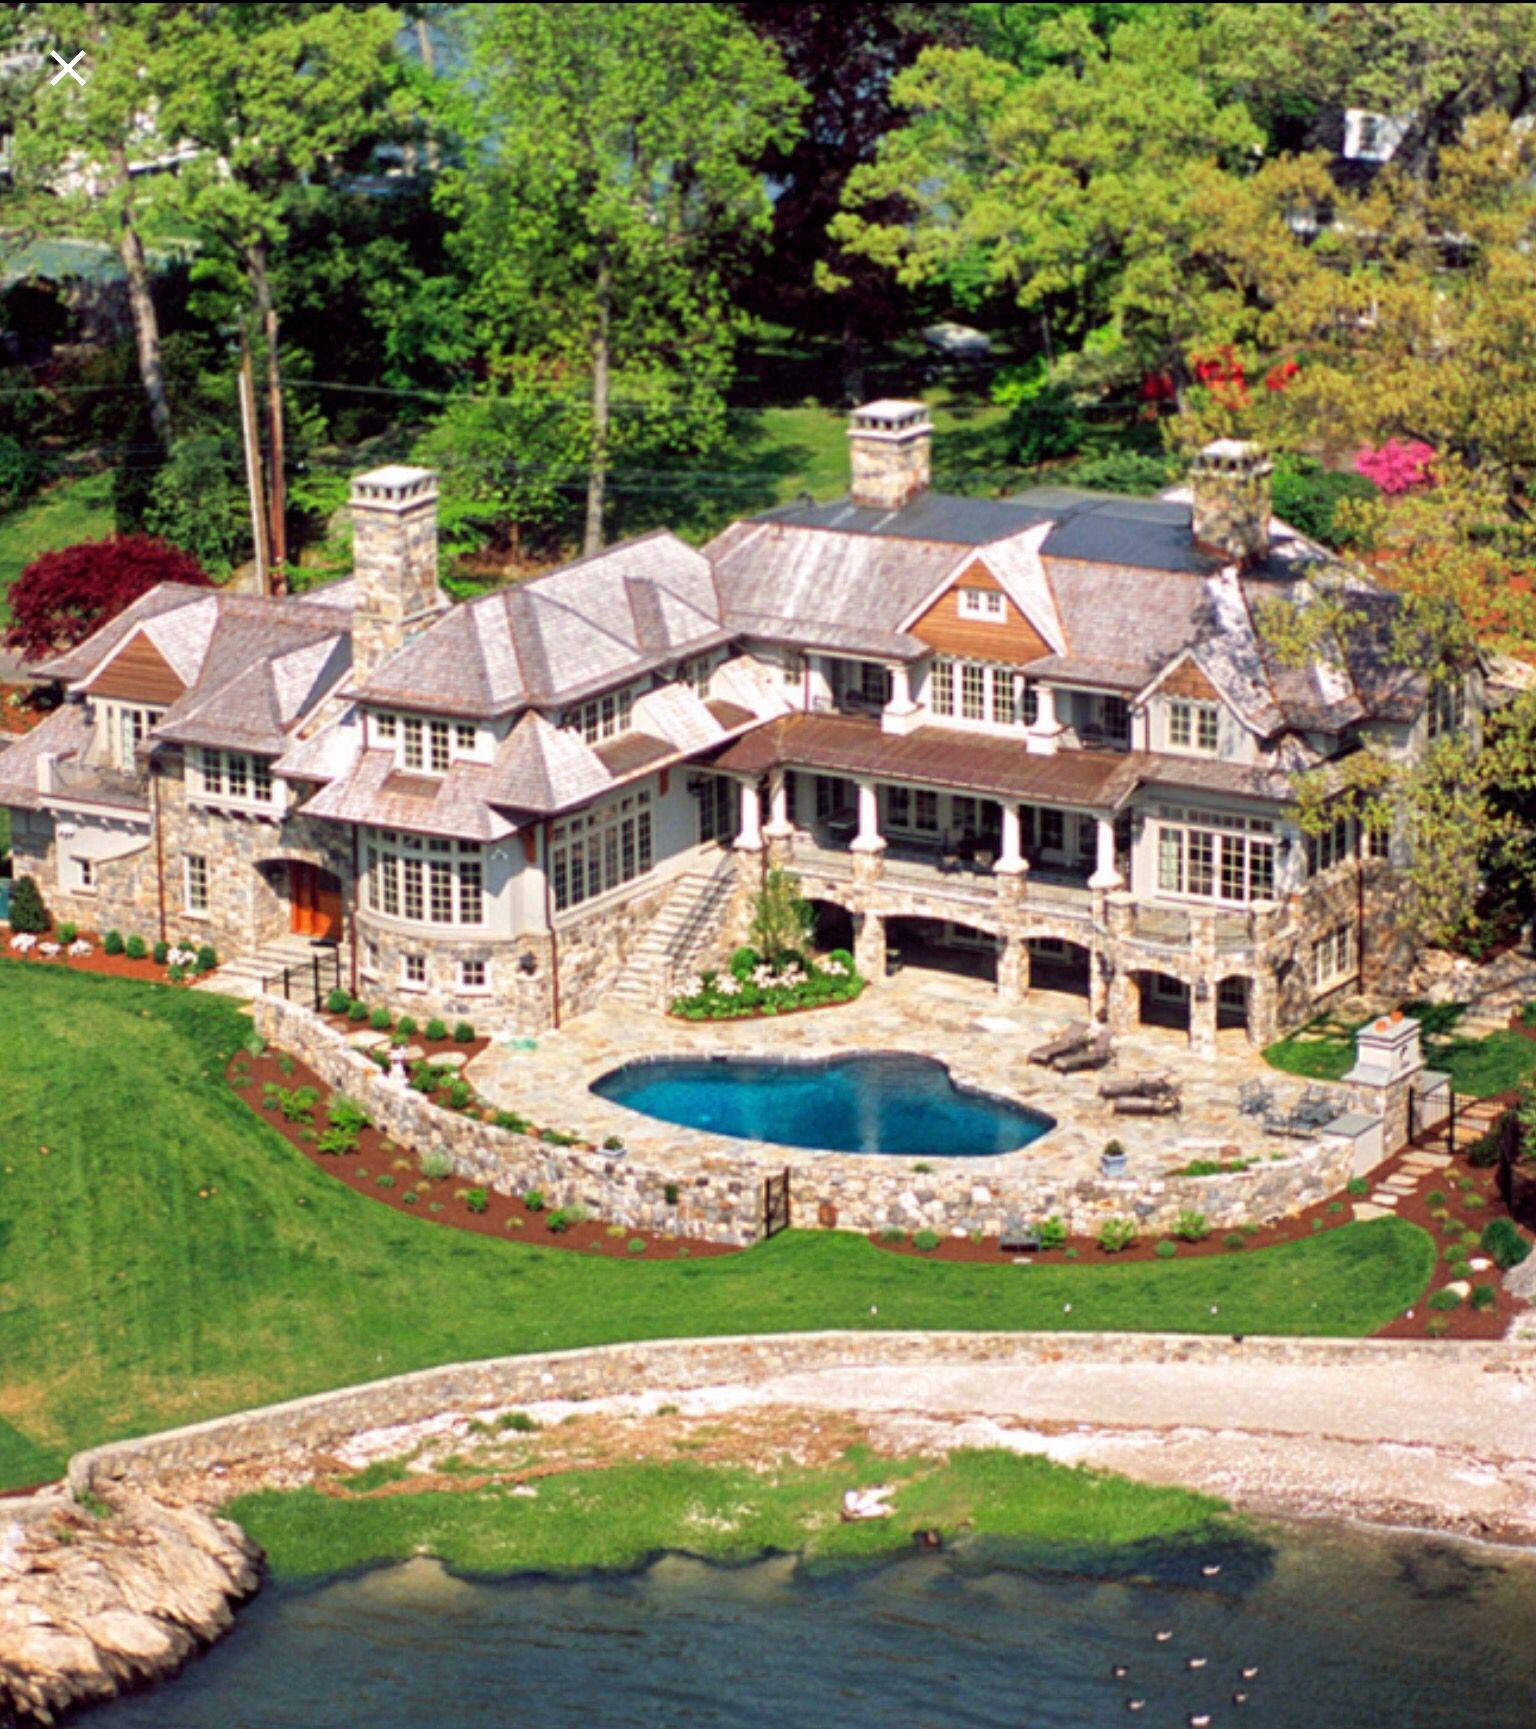 Aluxurylifestyle pinterestbillionaire mansiones - Mansiones de ensueno ...